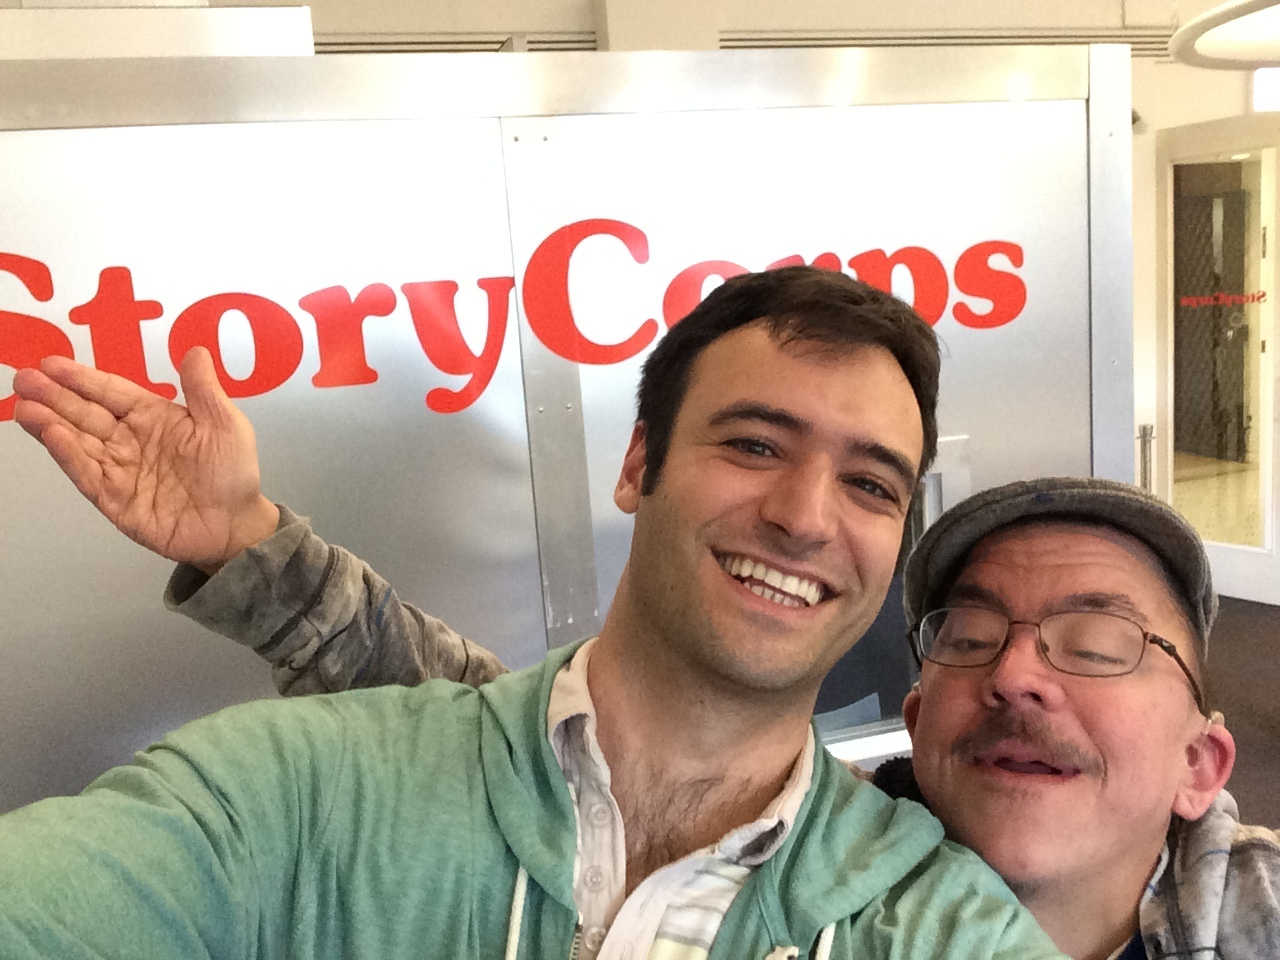 Mike StoryCorps 2.JPG